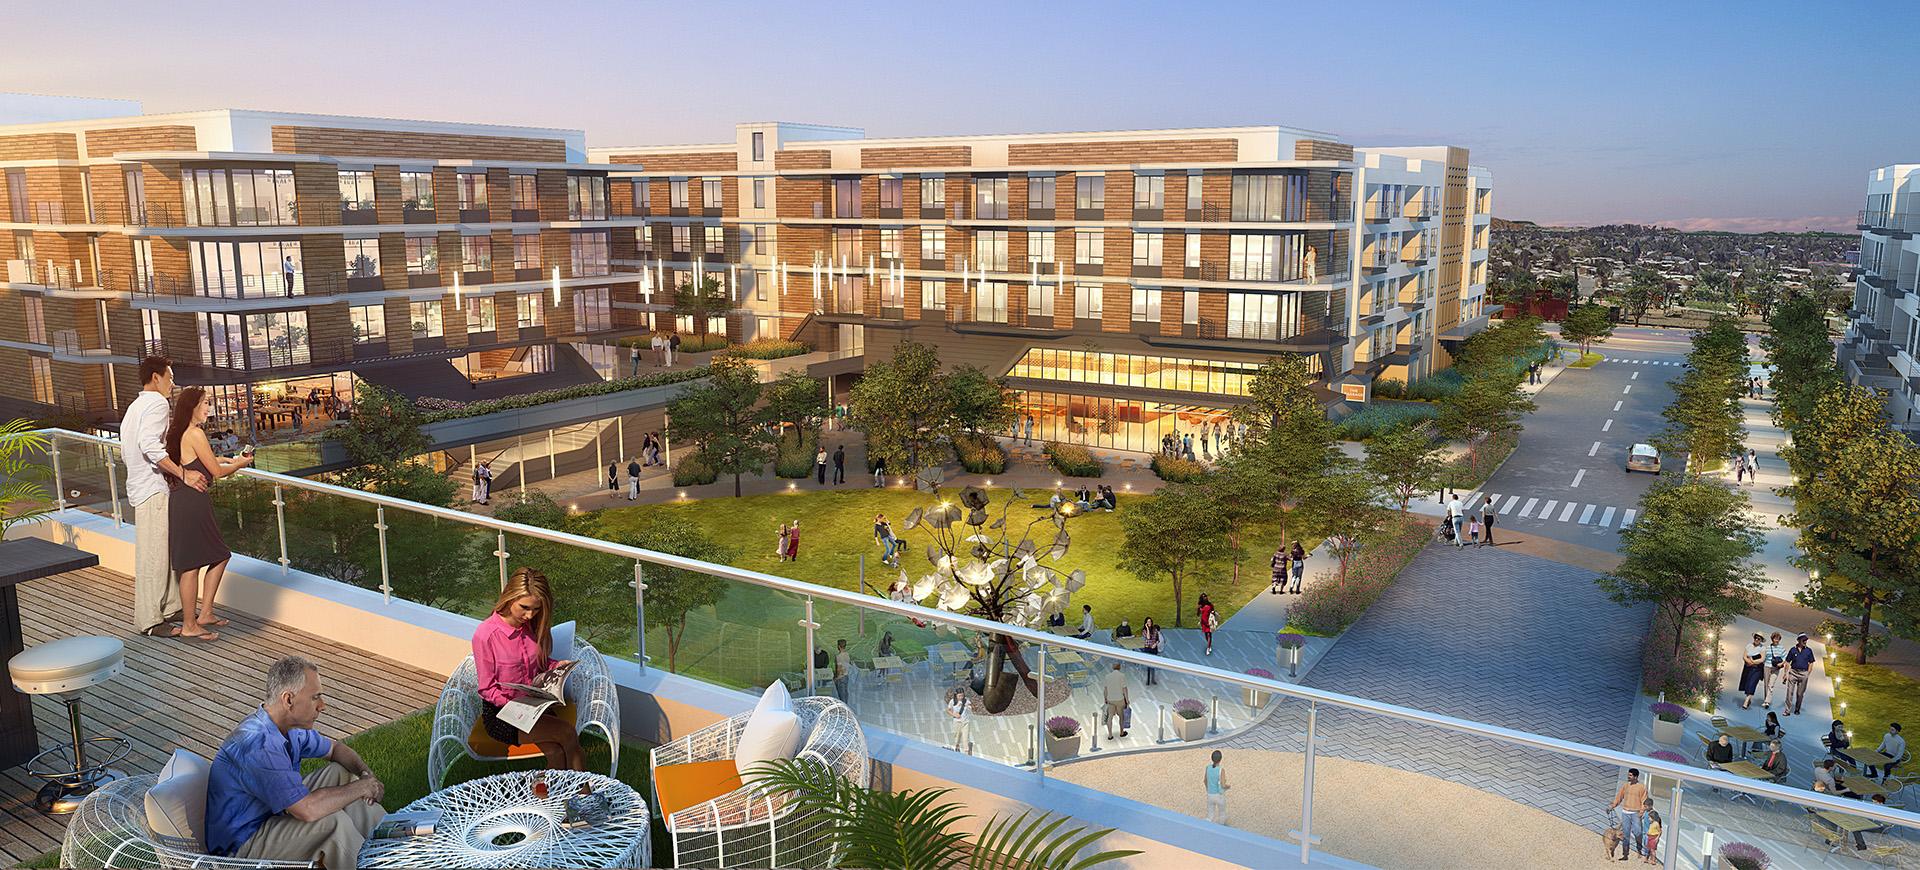 San Mateo's Hayward Park Sees Building Surge